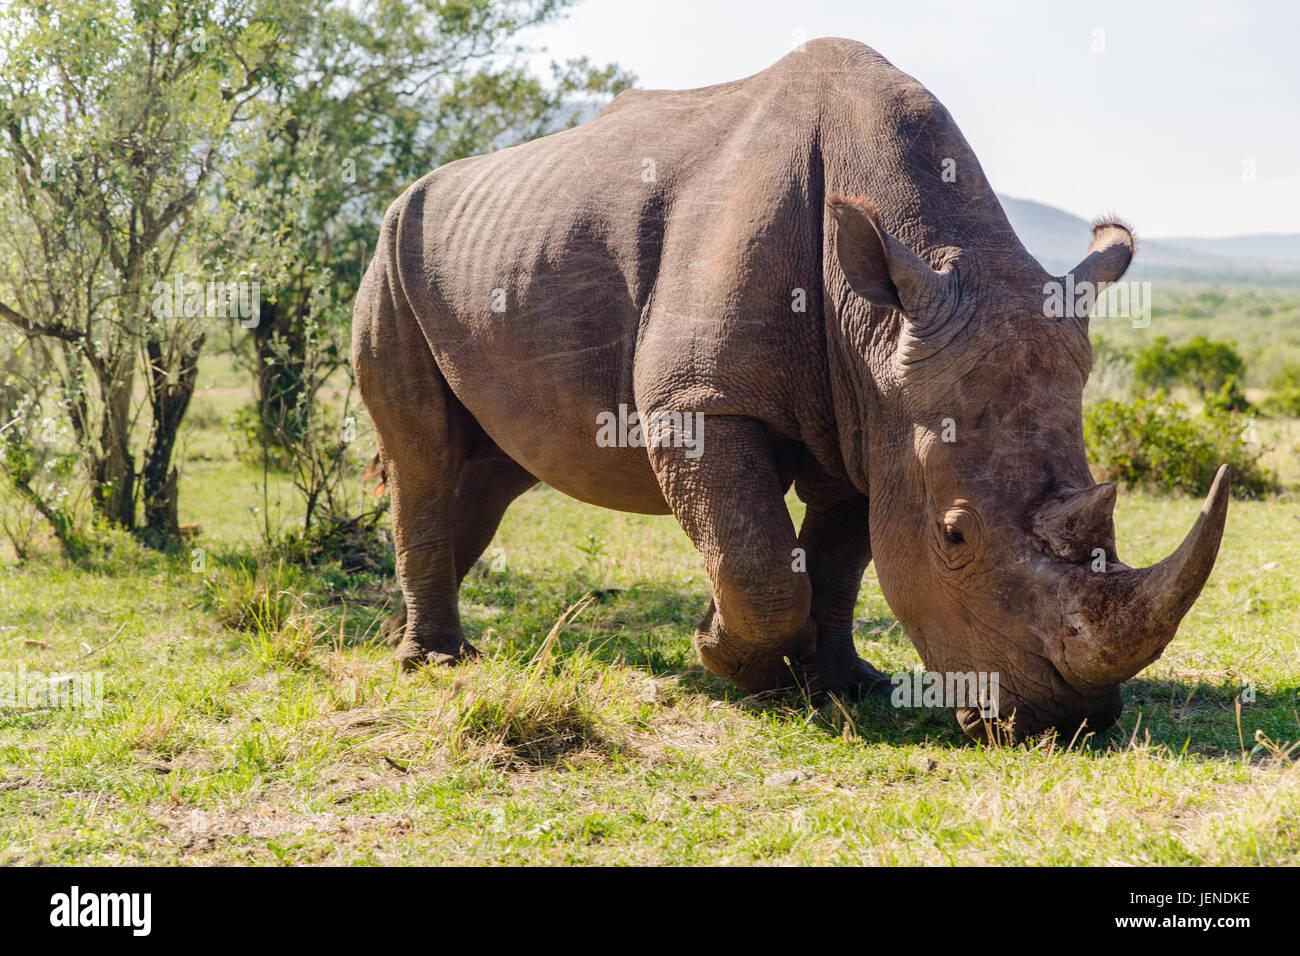 rhino grazing in savannah at africa - Stock Image